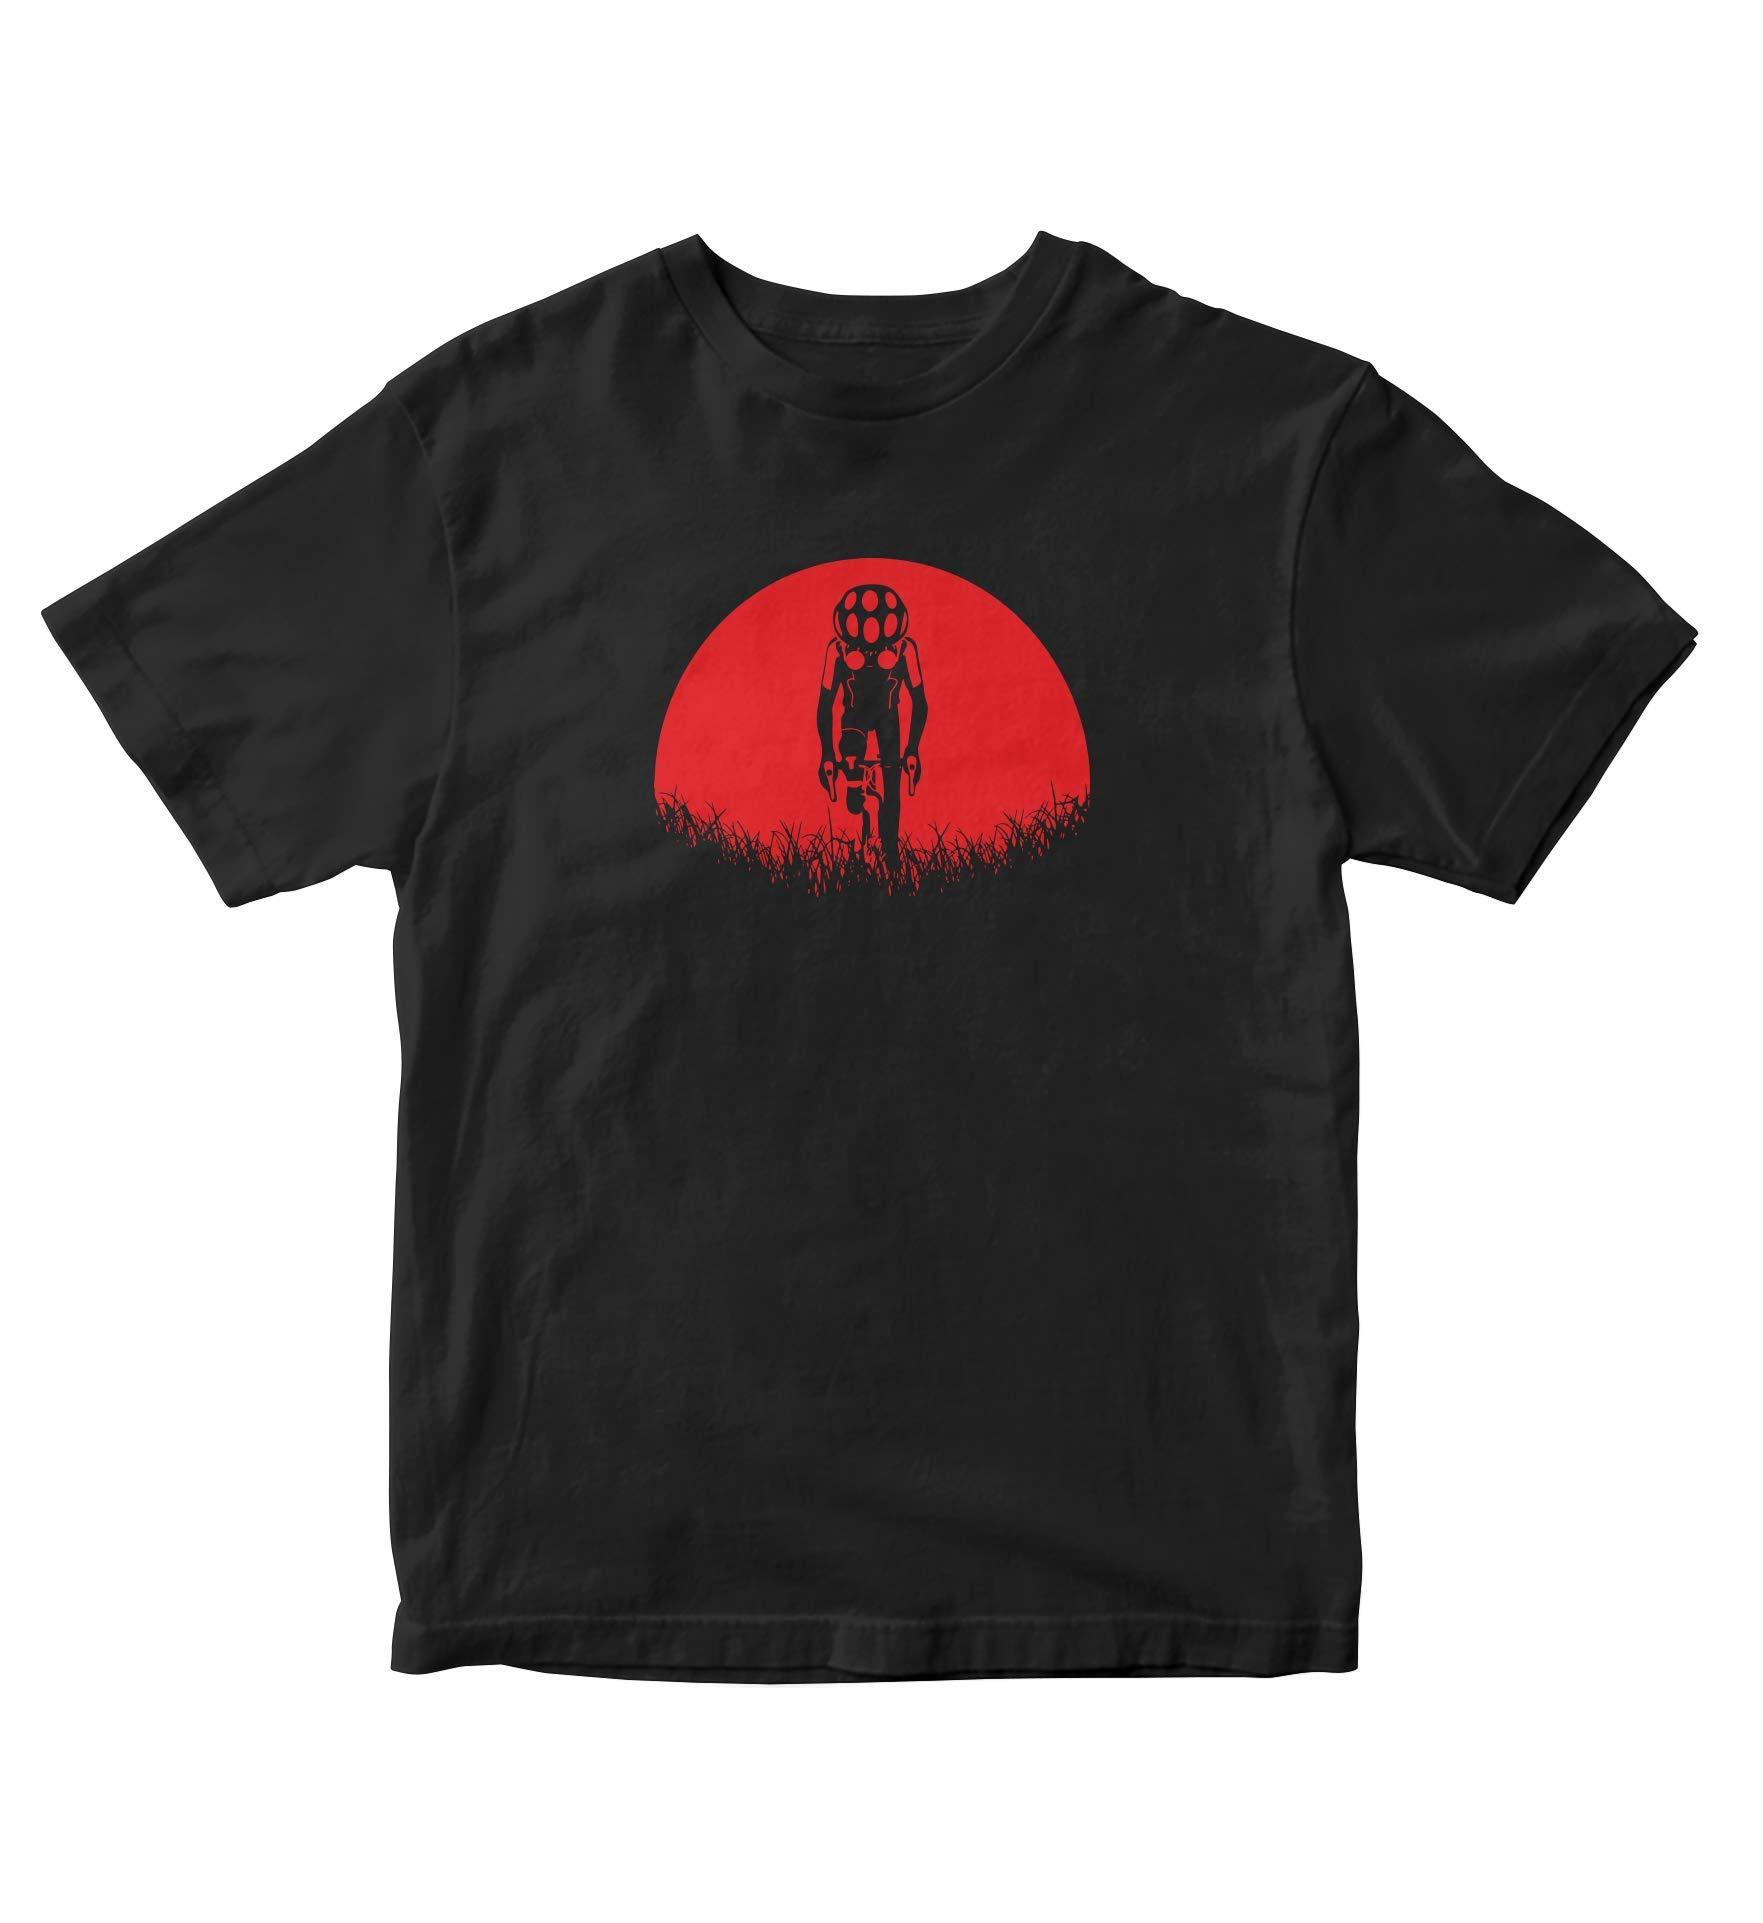 Onoda Sakamichi Yowamushi Pedal Series T Shirt Adult S Anime Manga A682